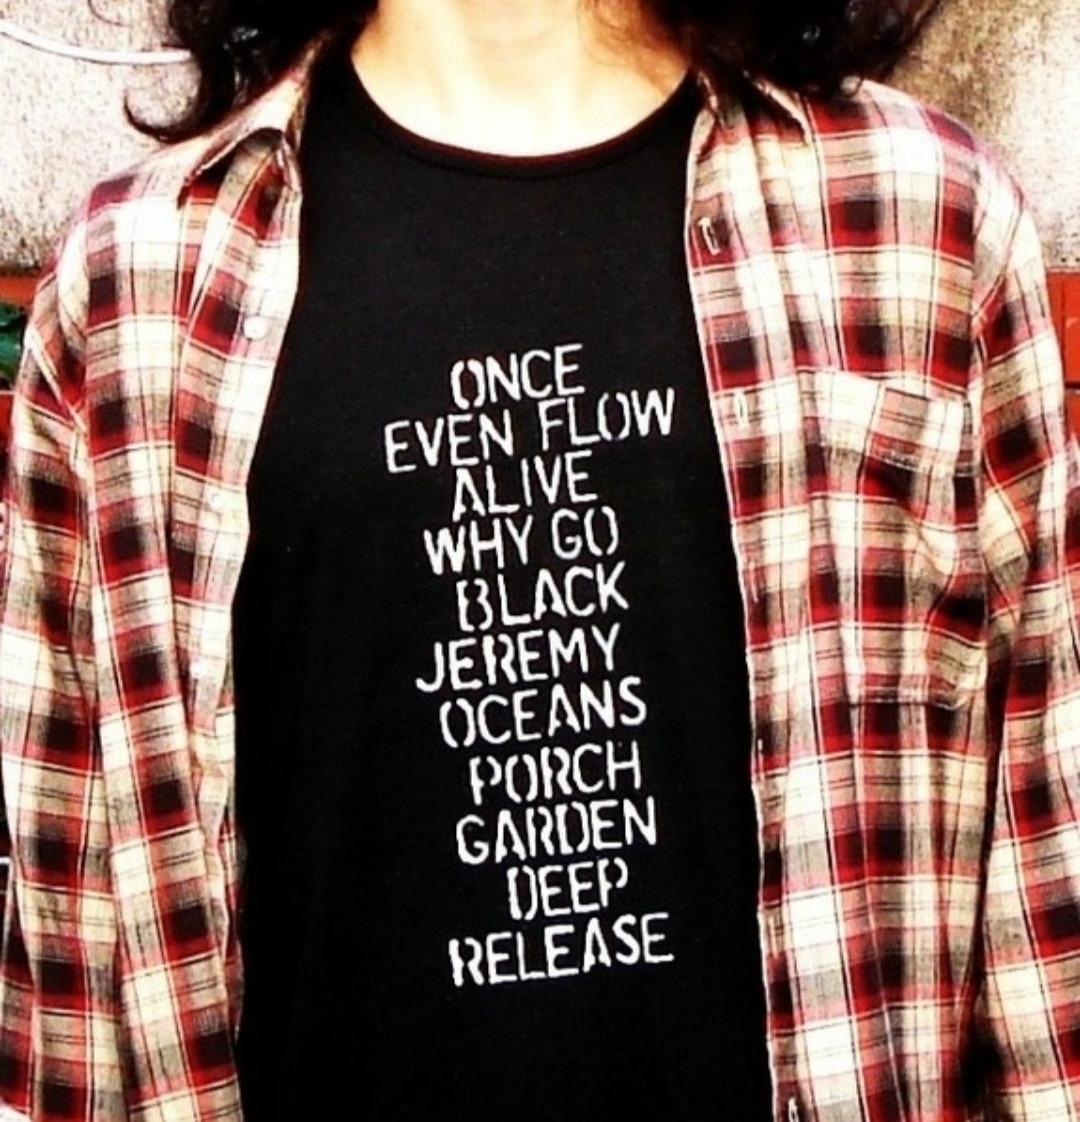 2018 New Casual Short Sleeved Black T shirts Pearl Jam Ten Tops Unisex Men Women Grunge Rock Band Tees Plus Size Tumblr Tees